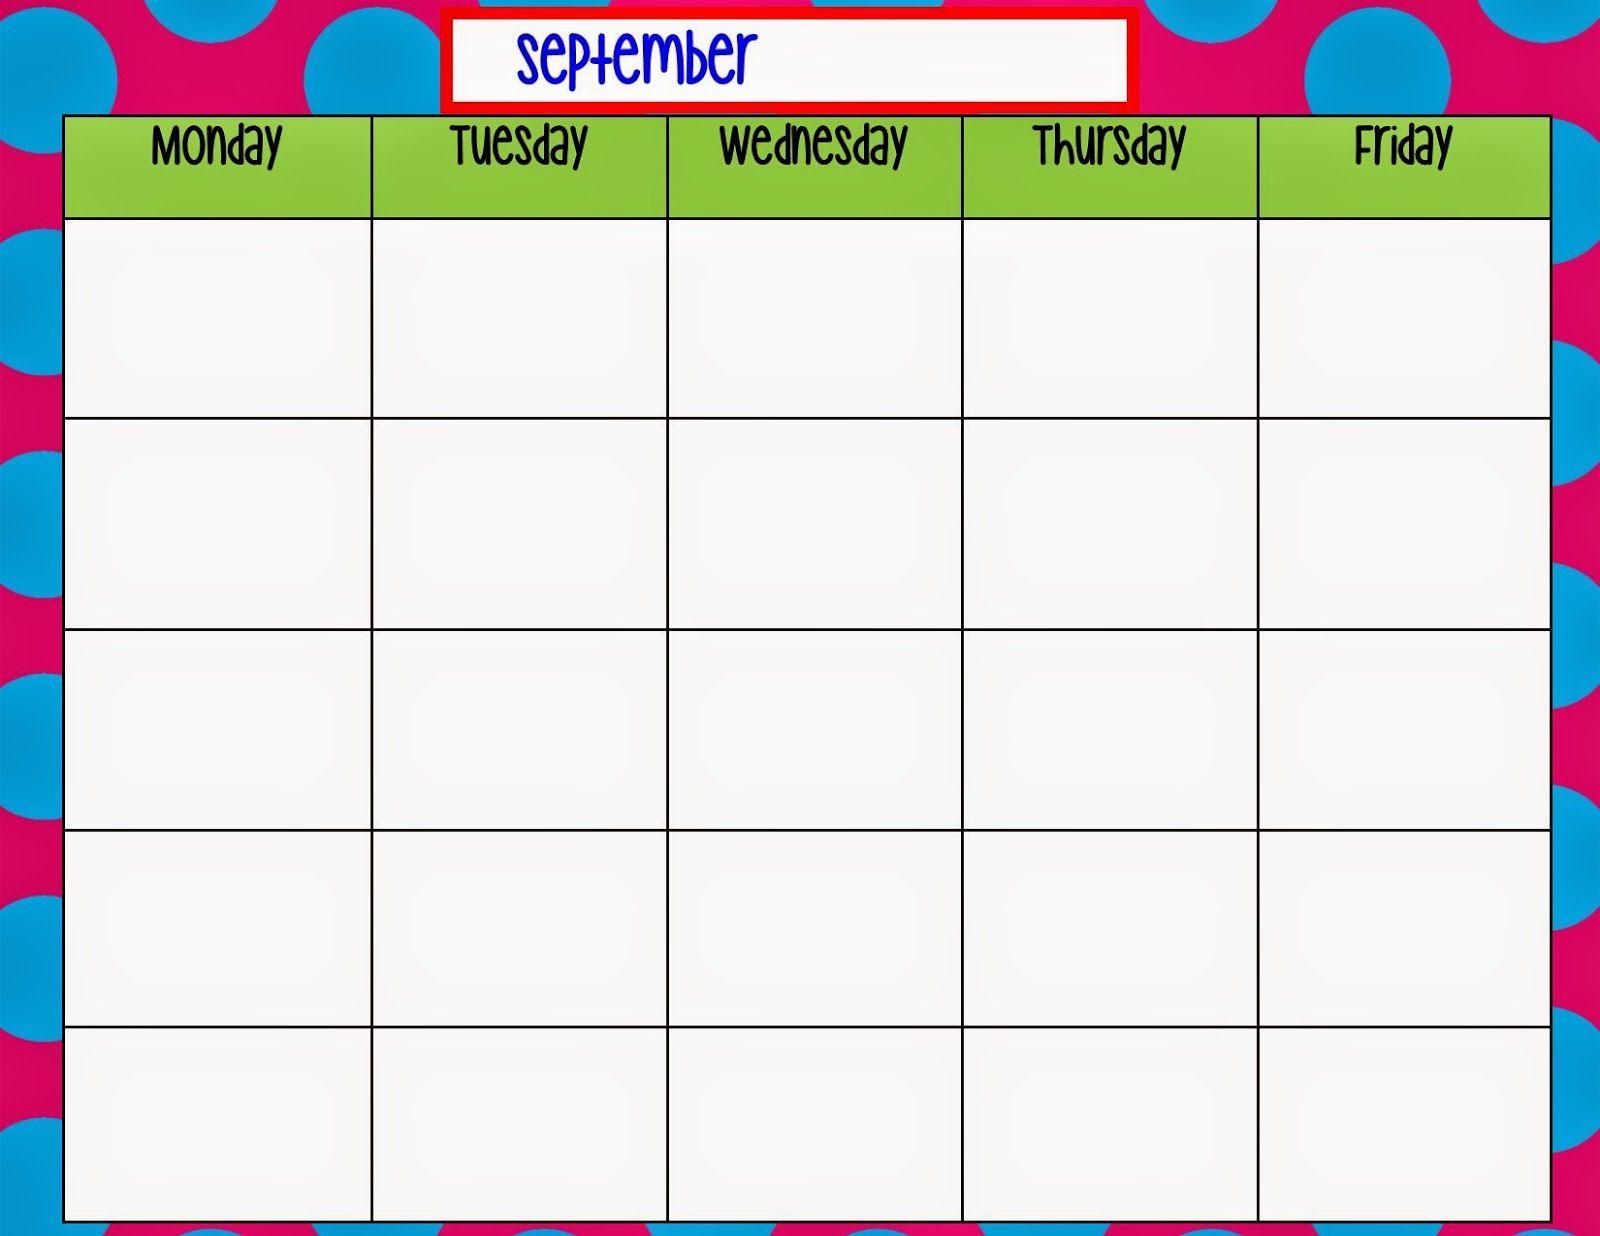 Monday Through Friday Calendar Template | Weekly Calendar intended for Monday To Friday Calendar